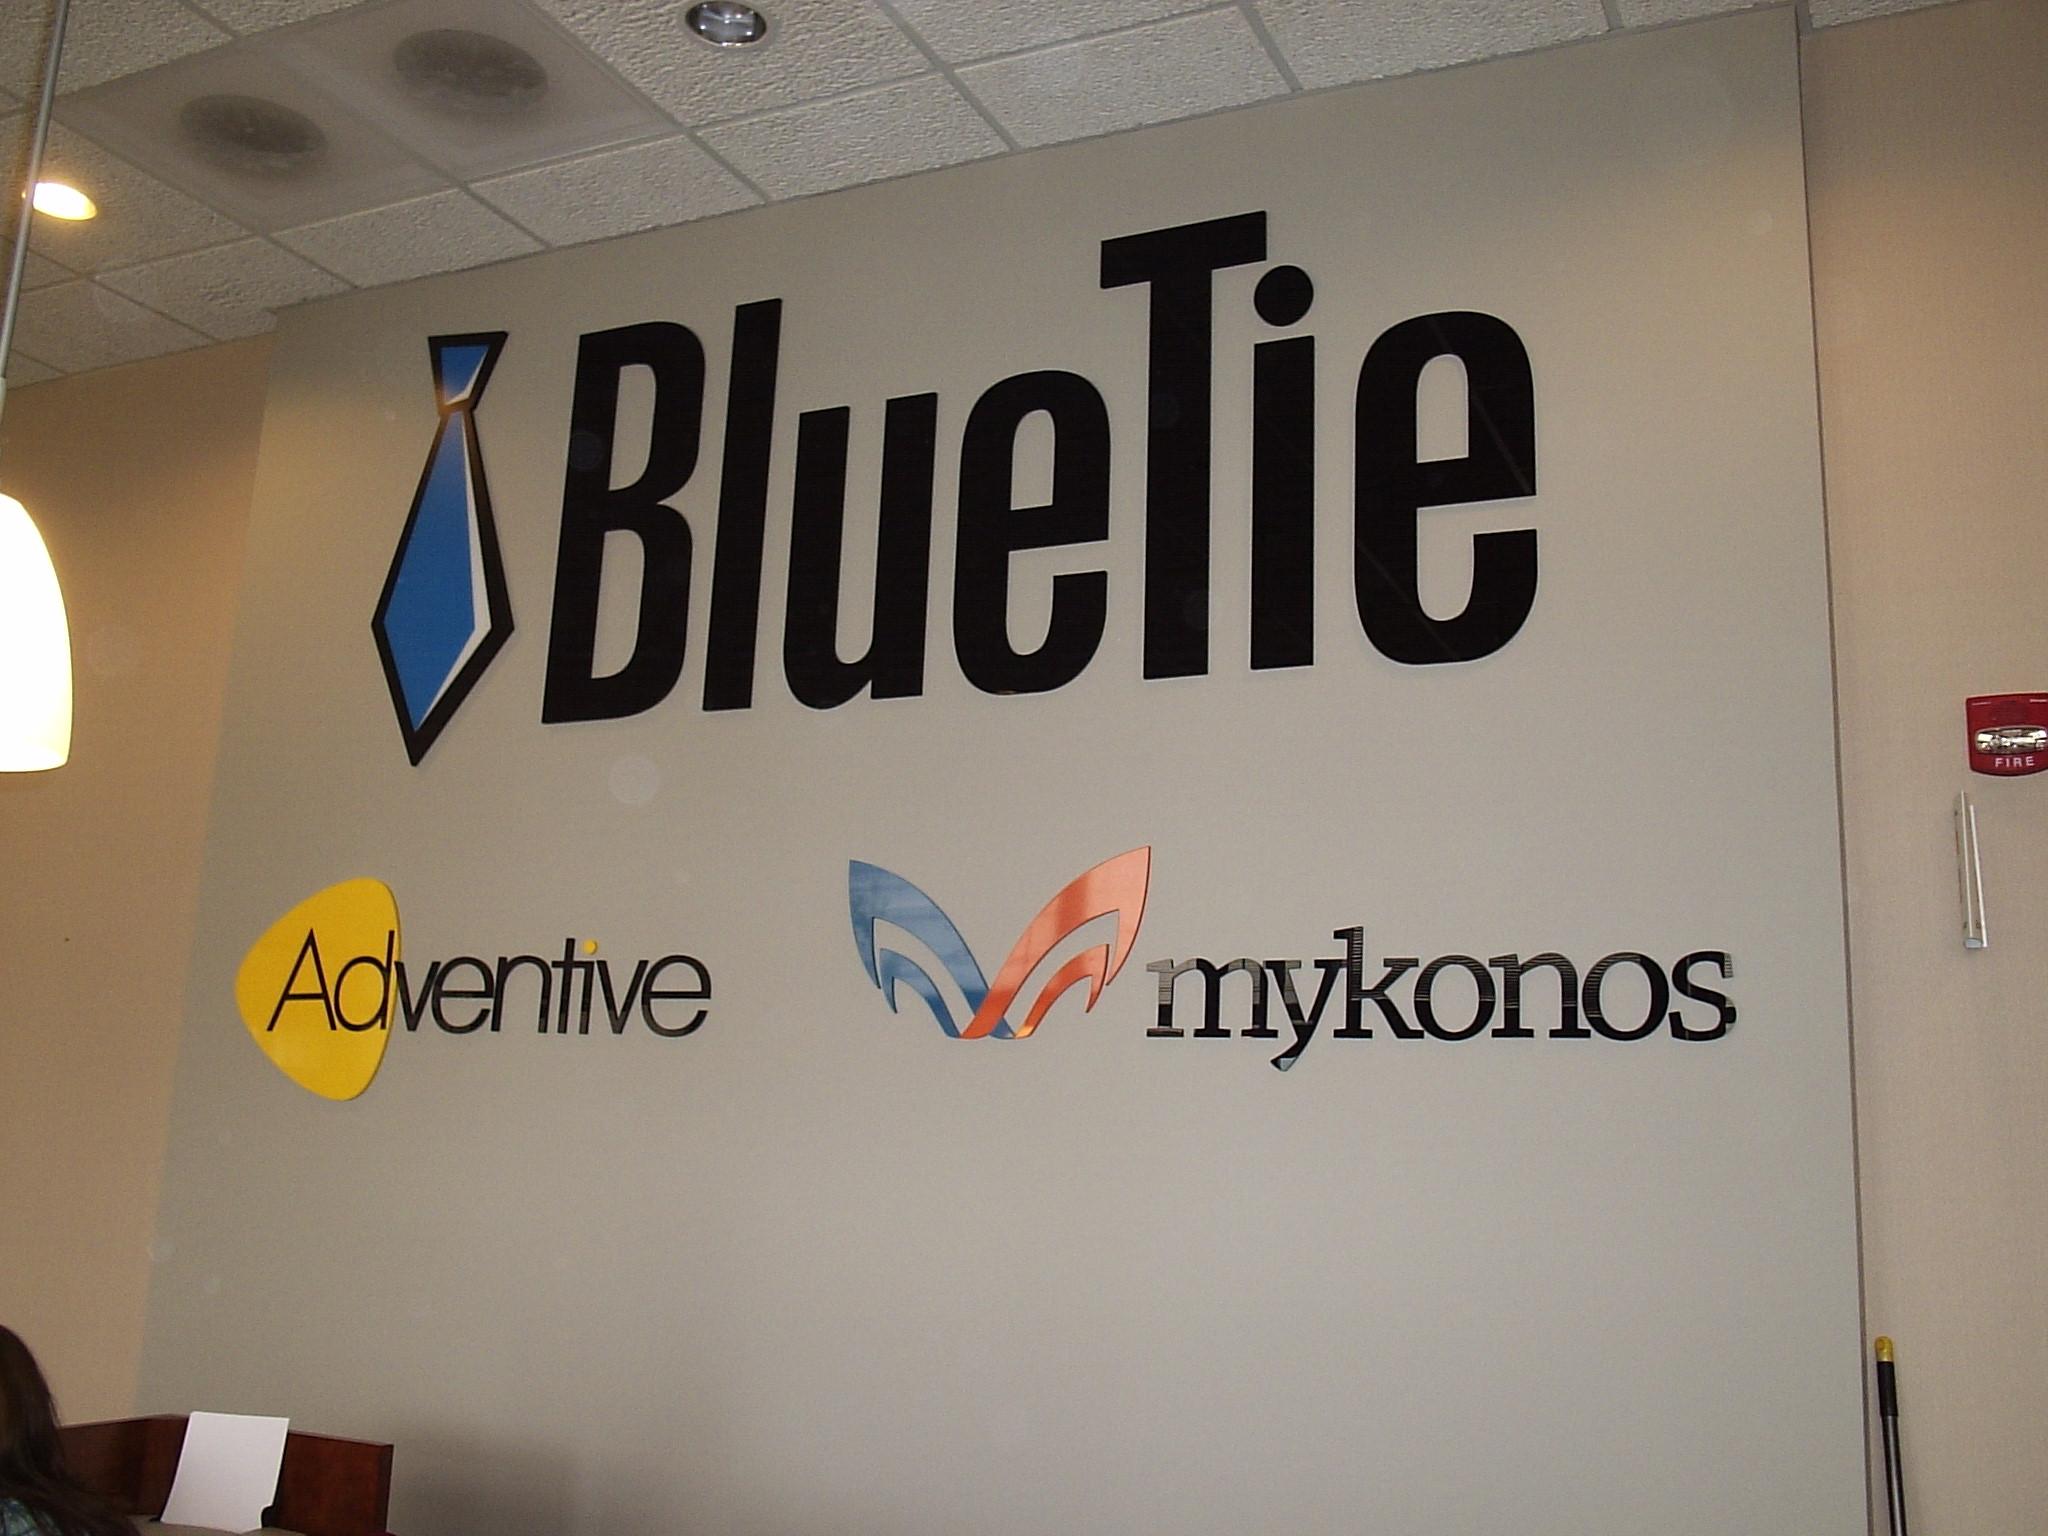 blue tie flat cut plastic flush mount.JPG